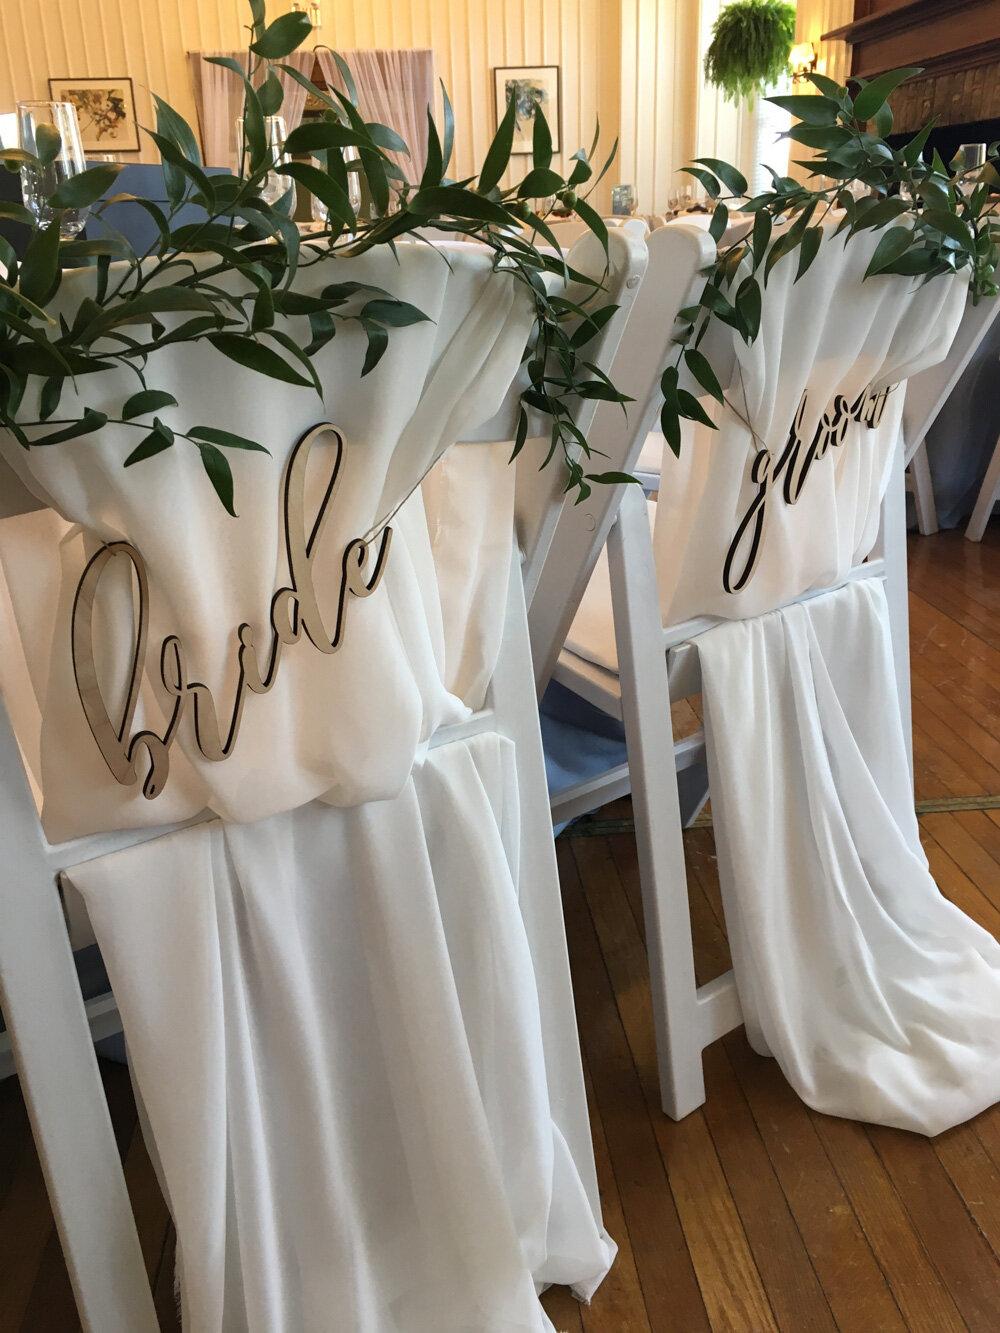 vineyard-bride-vendor-spotlight-the-swish-list-sparkle-and-twine-event-planning-design-wedding-vendors-niagara-toronto-southern-ontario-007.jpg